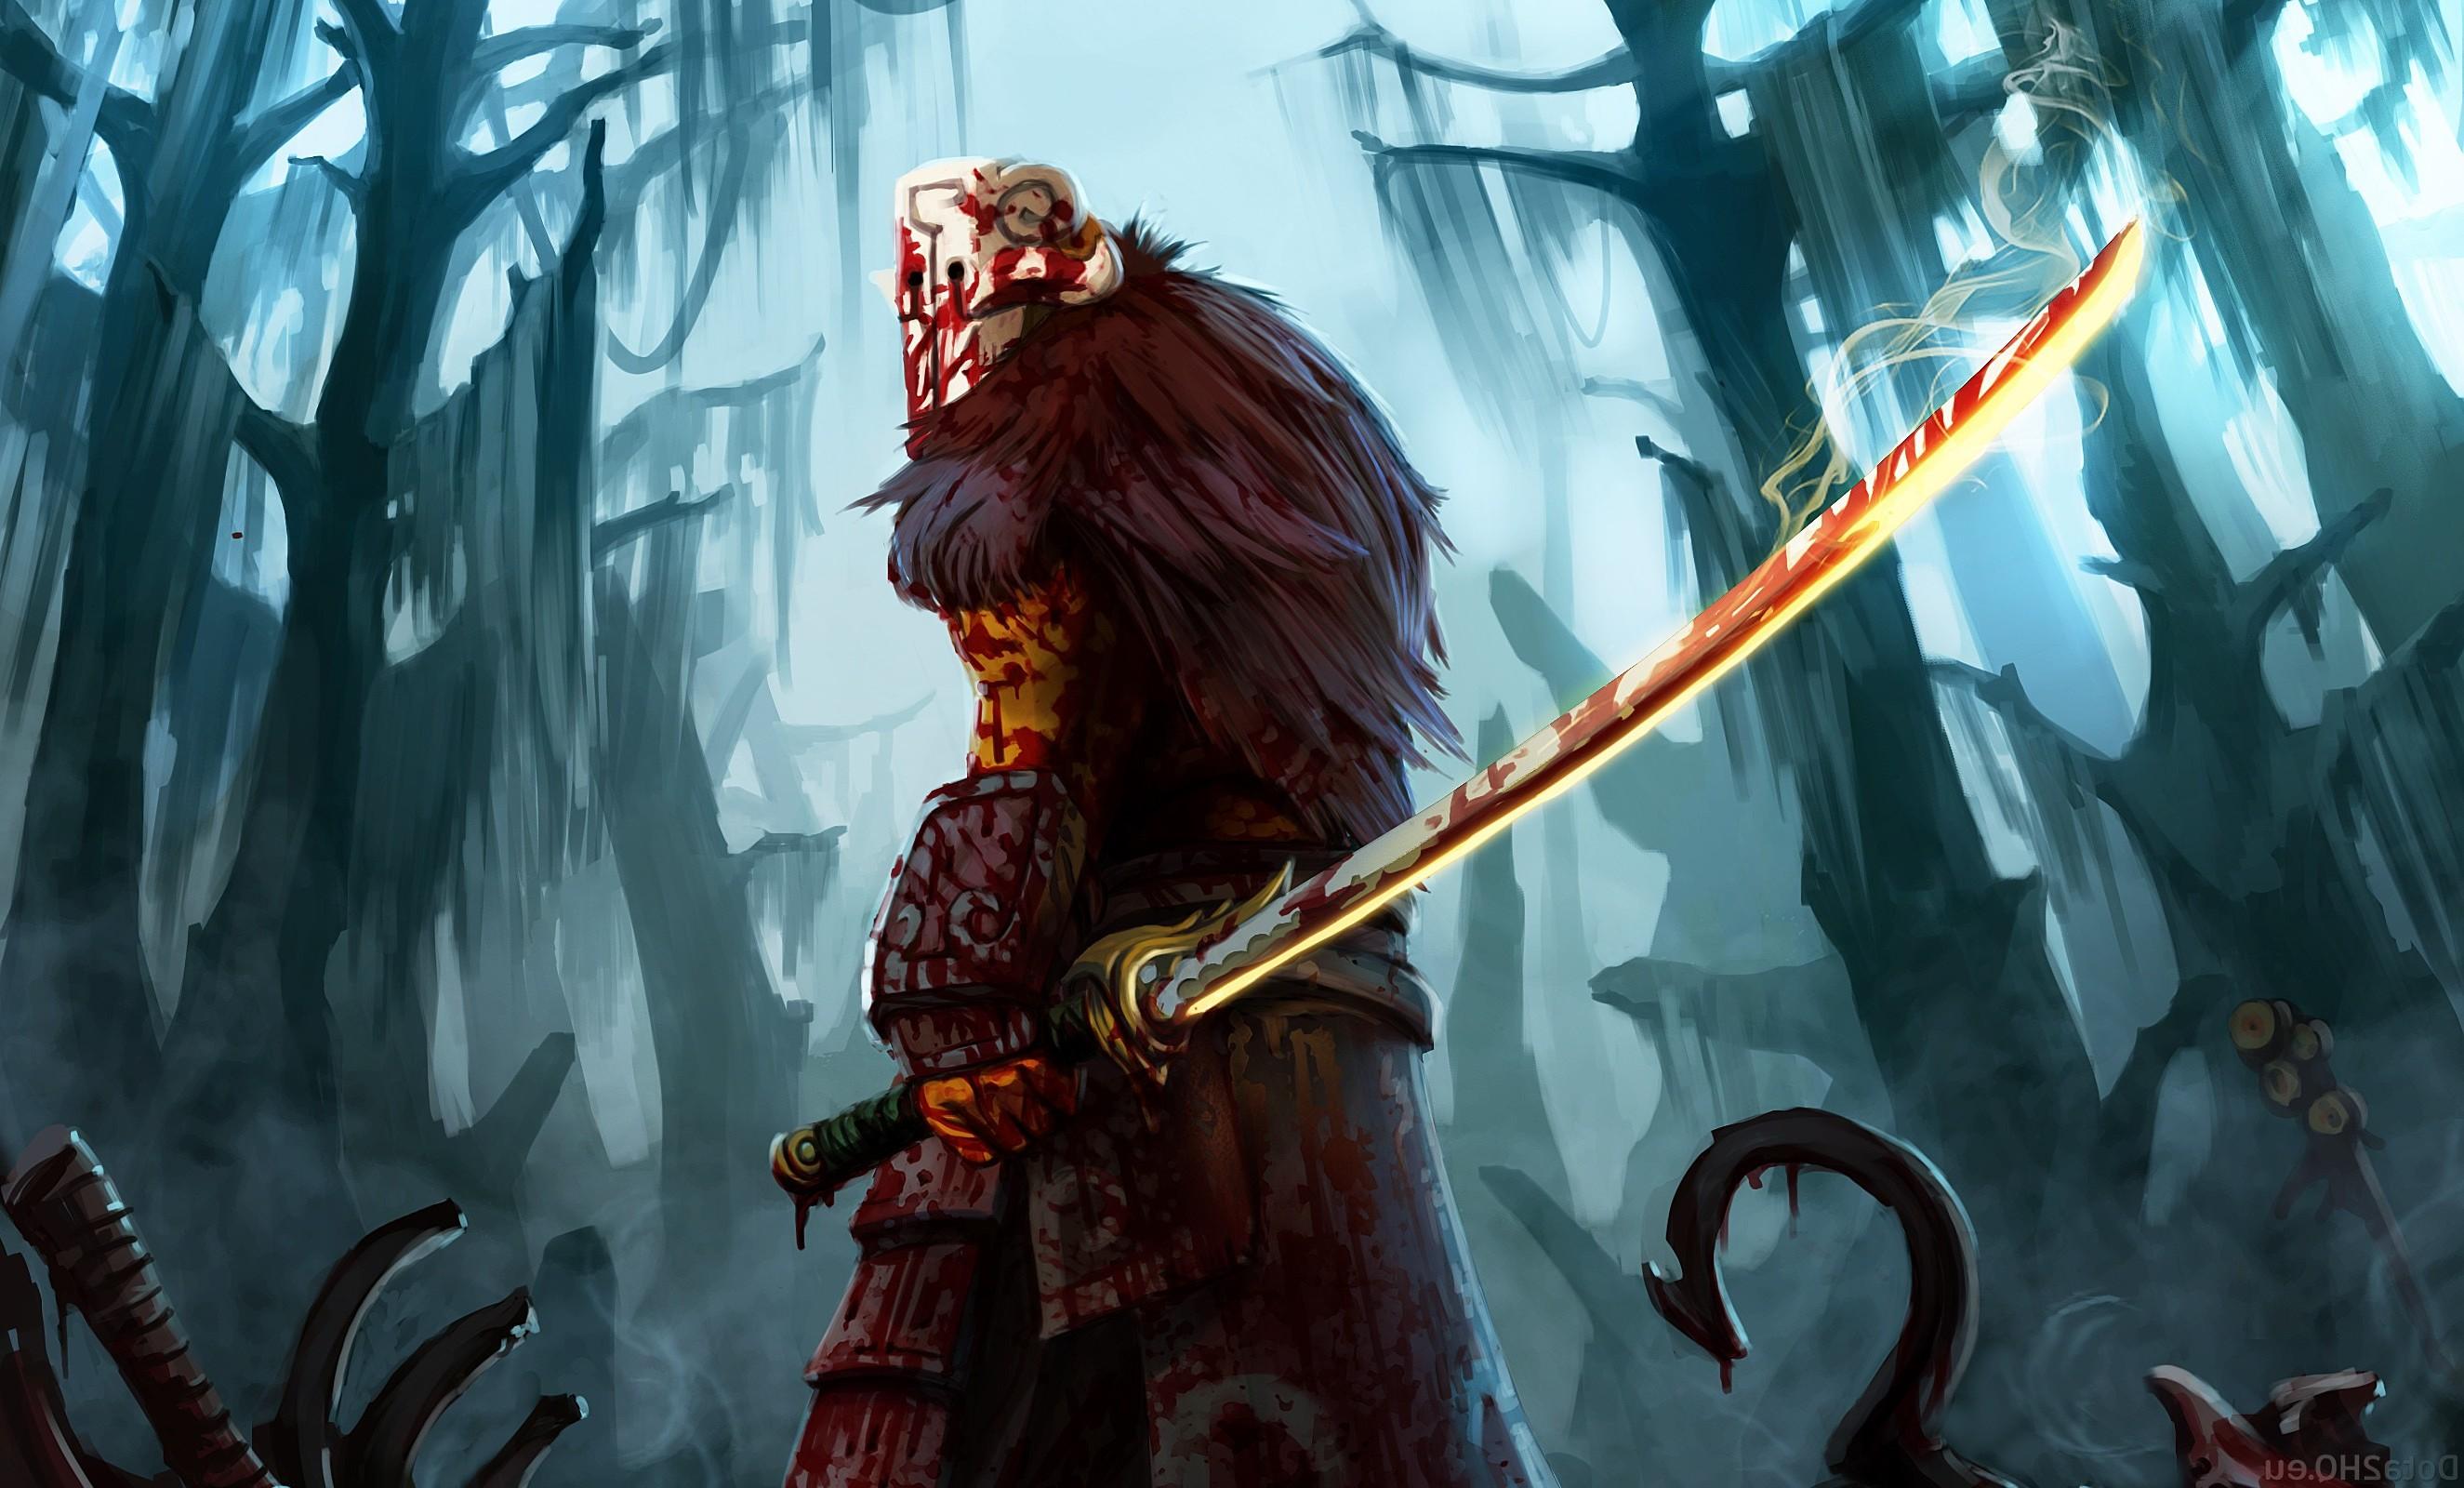 2650x1600 Px Defense Of The Ancient Dota 2 Juggernaut Valve Corporation